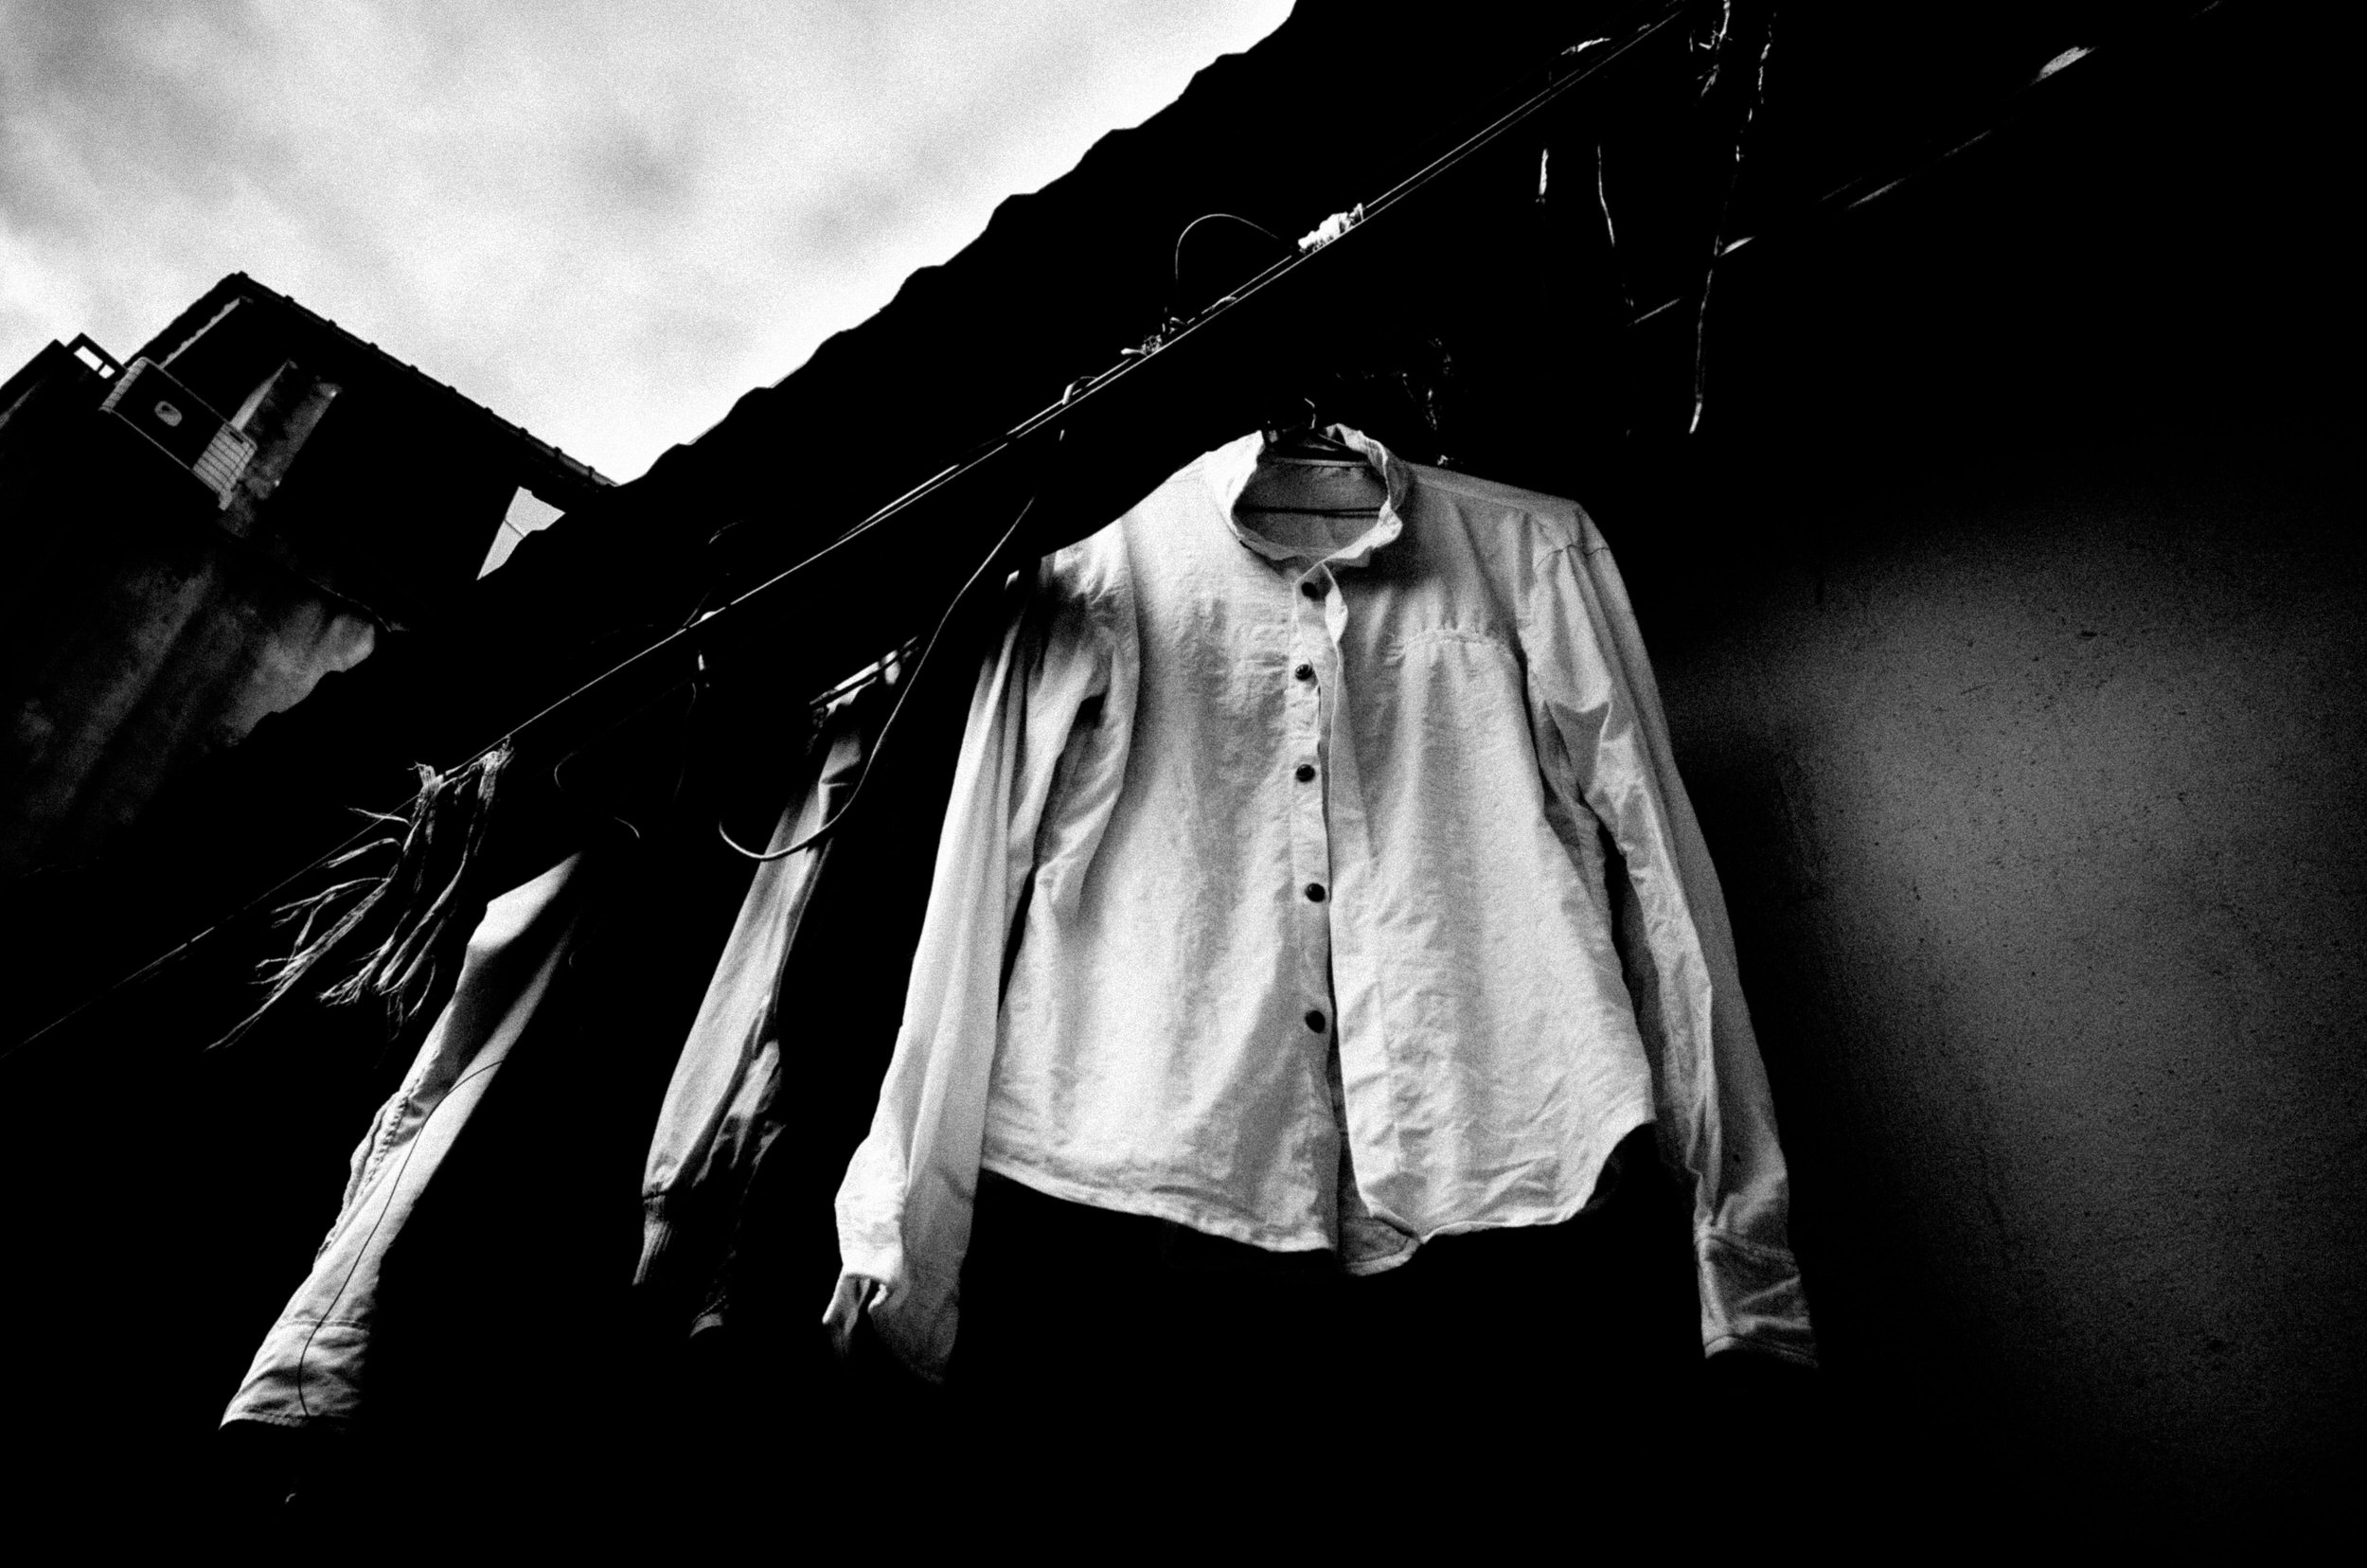 eric kim street photography black and white hanoi-0008829.jpg